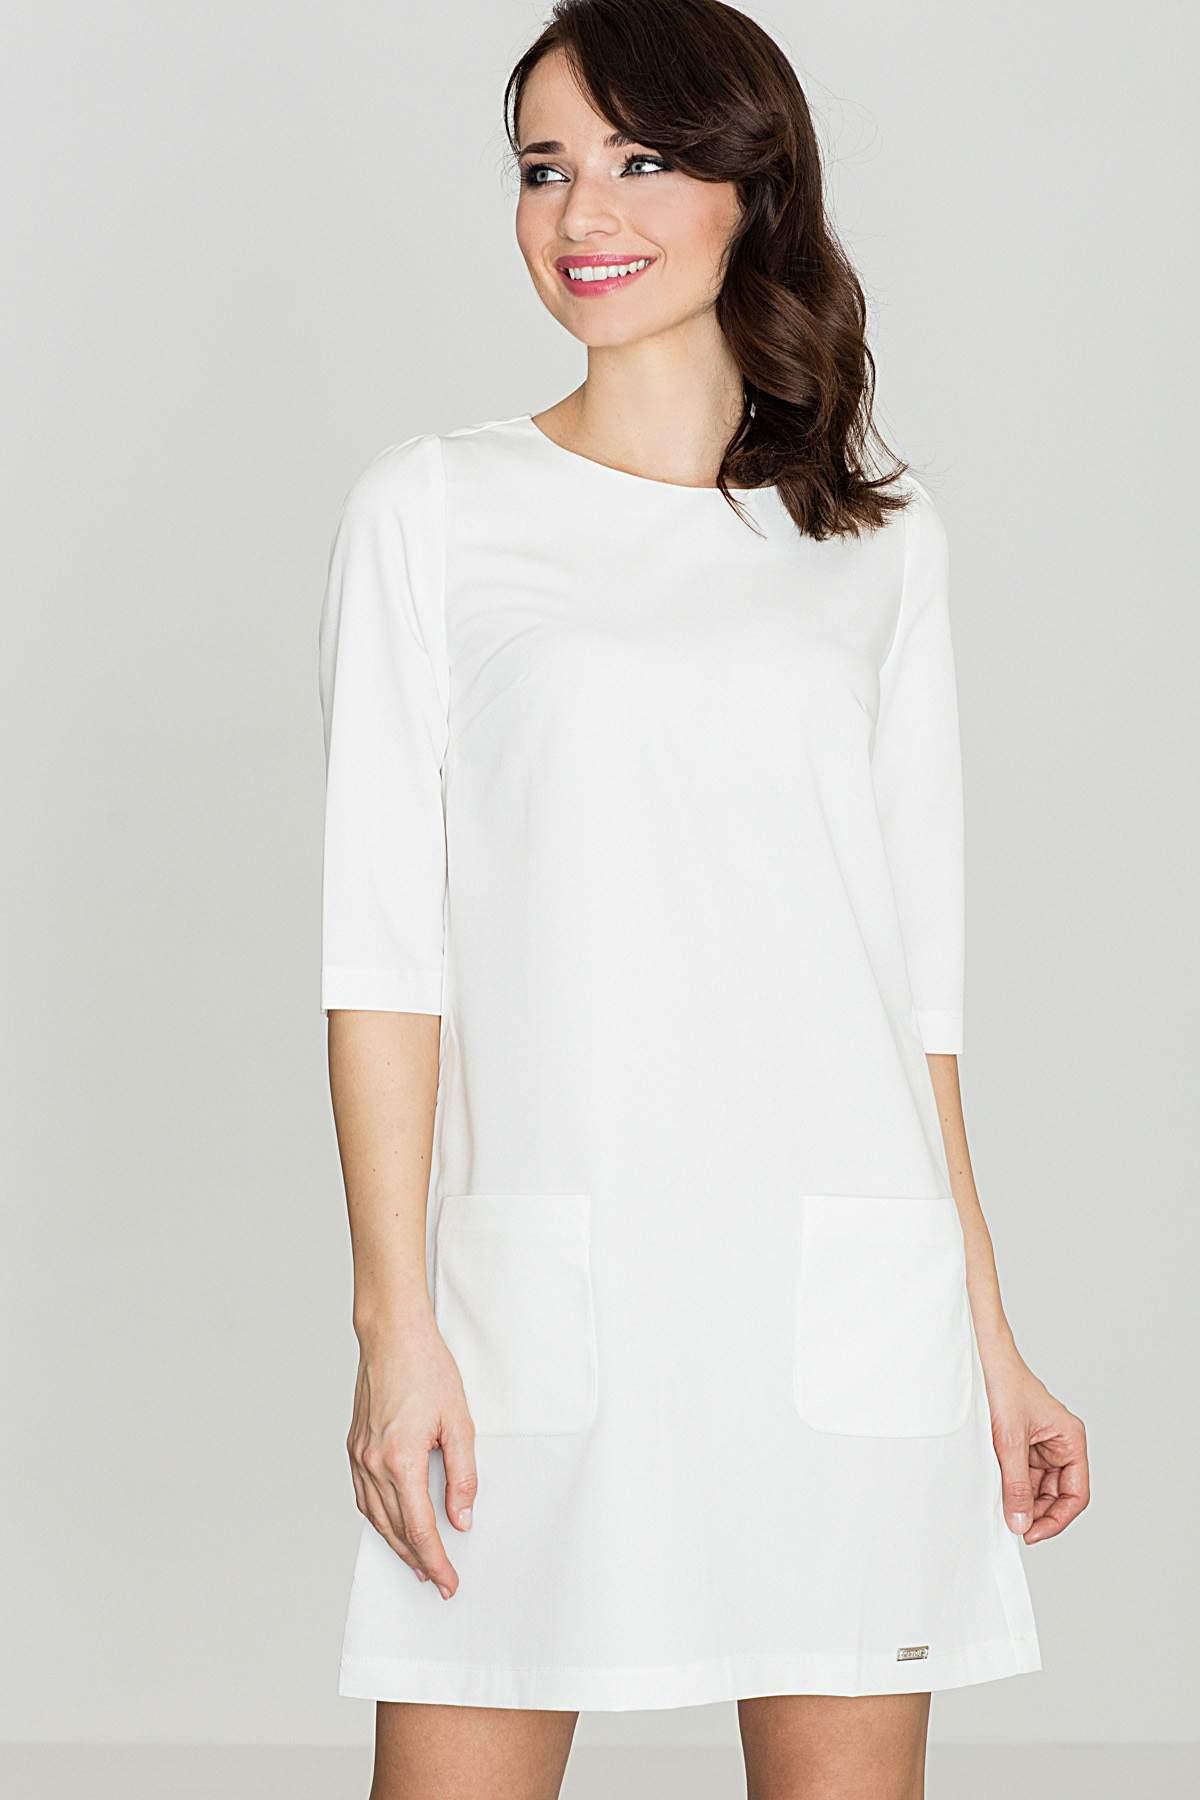 KATRUS κομψο μινι φορεμα